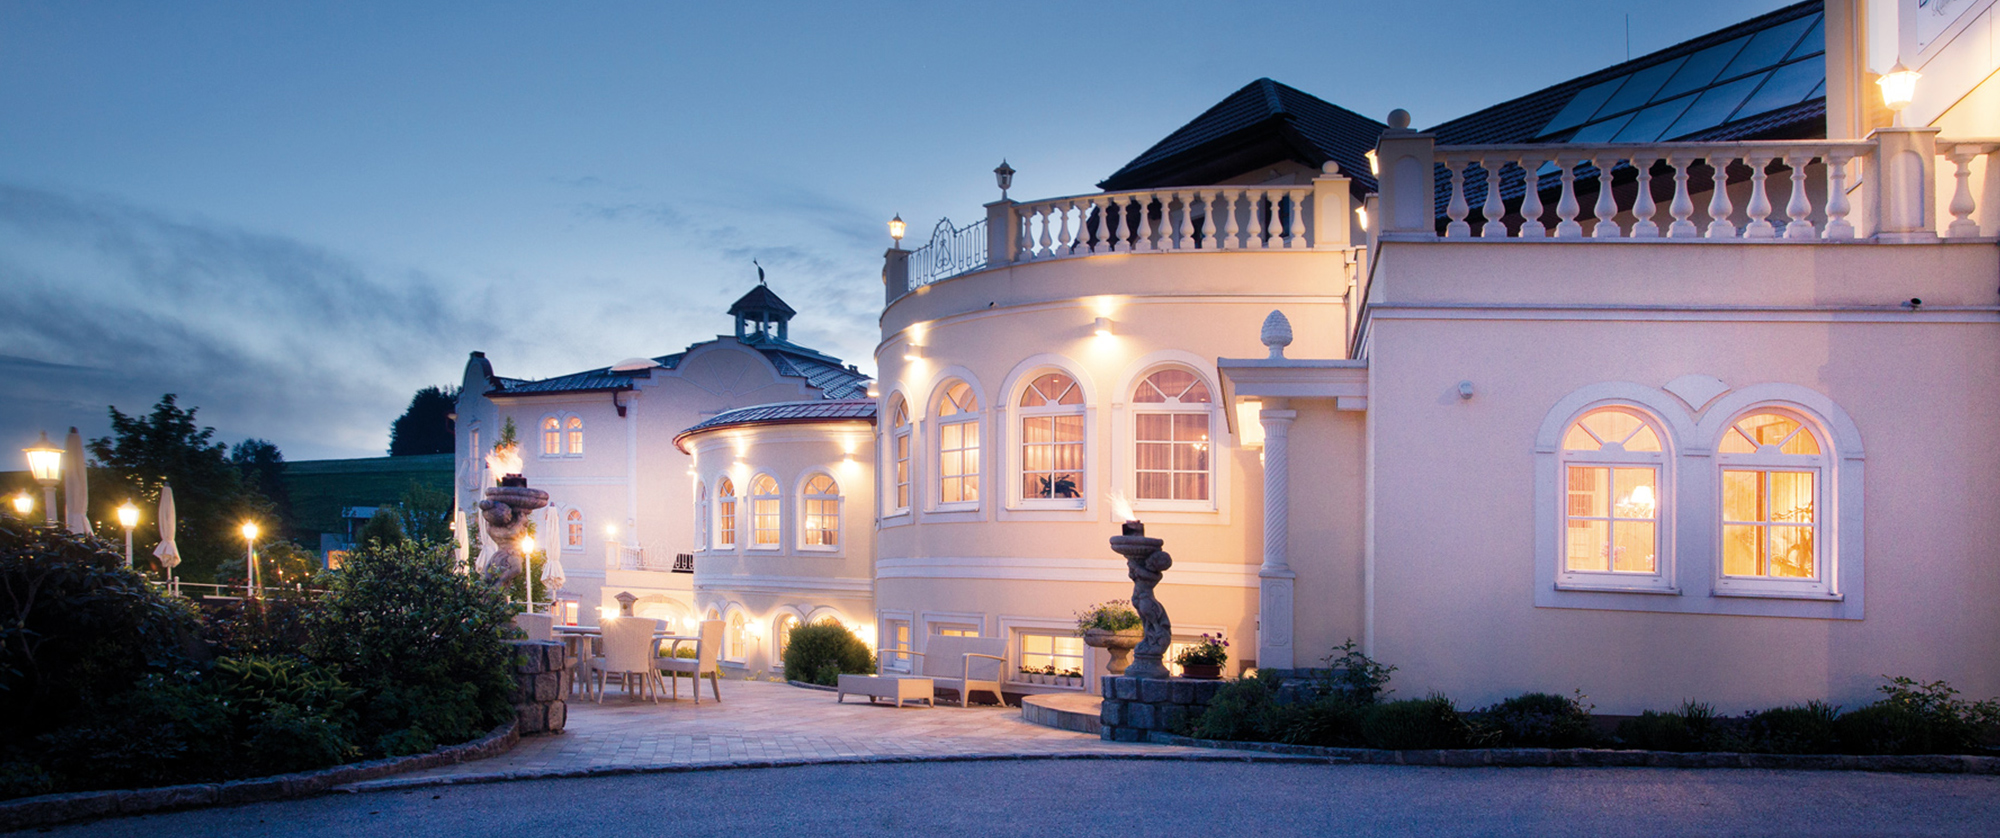 romantikhotel wellnesshotel ober sterreich m hlviertel hotel bergergut s loveness. Black Bedroom Furniture Sets. Home Design Ideas